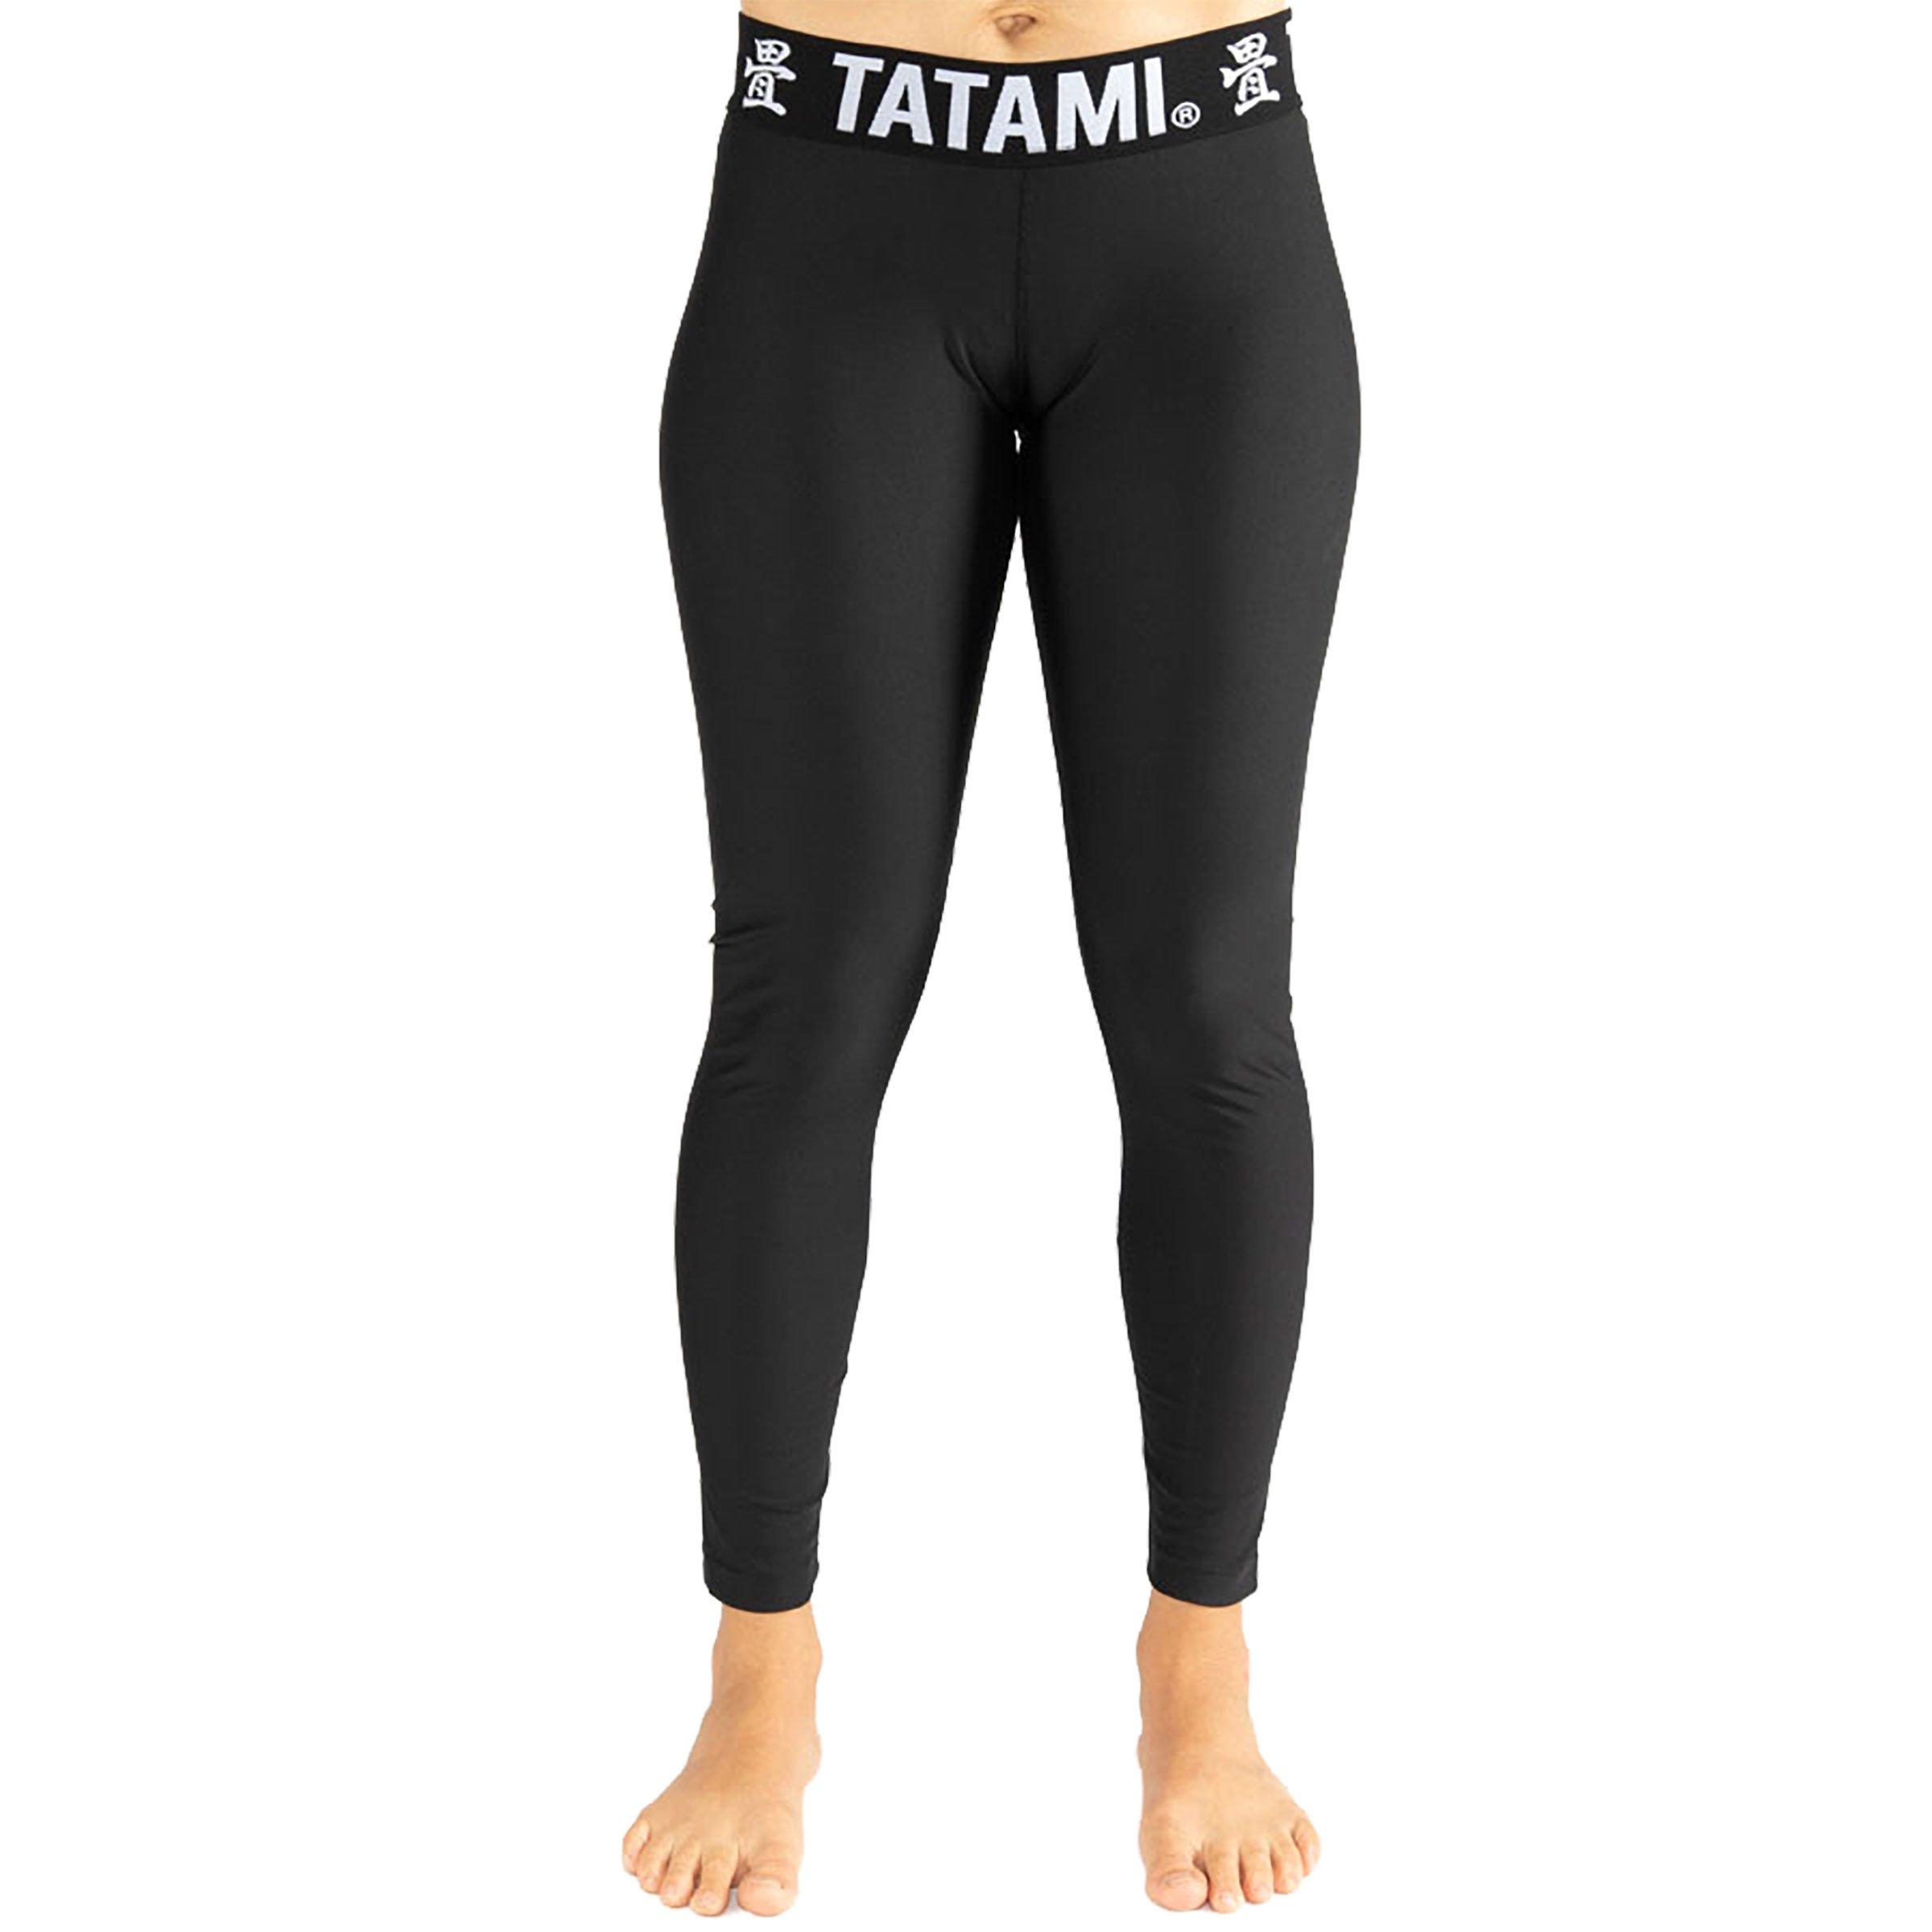 TATAMI Ladies Black Minimal Spats - Black - Small